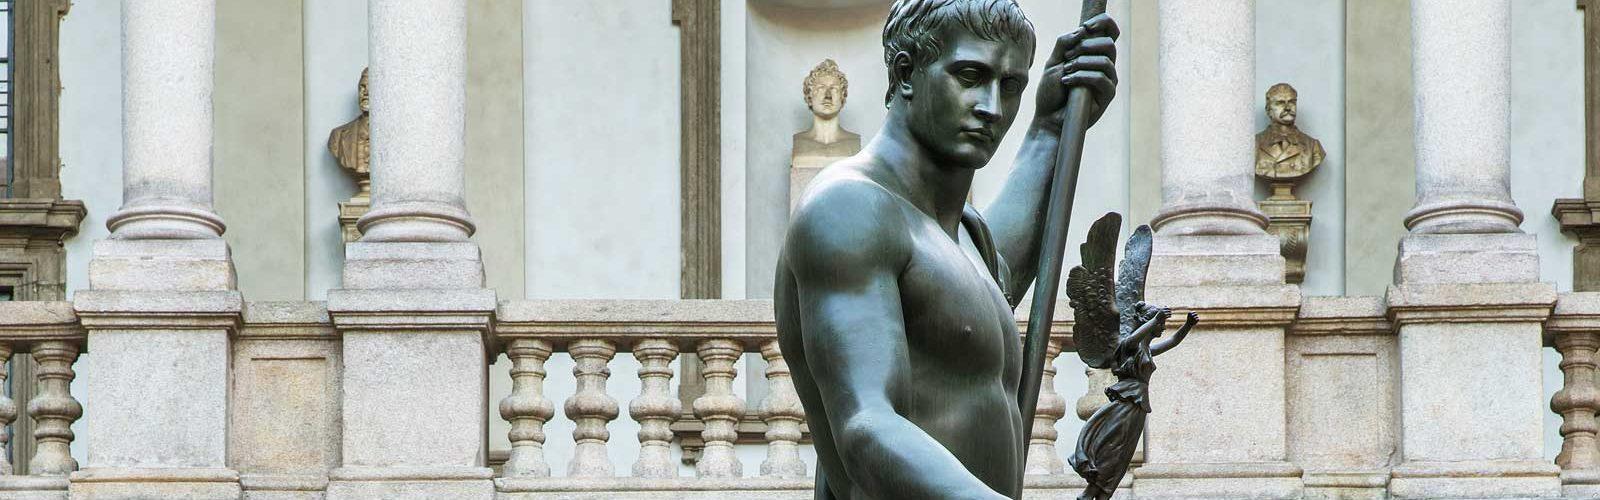 Quando Napoleone<br>immaginò il <em>Louvre</em> d'Italia